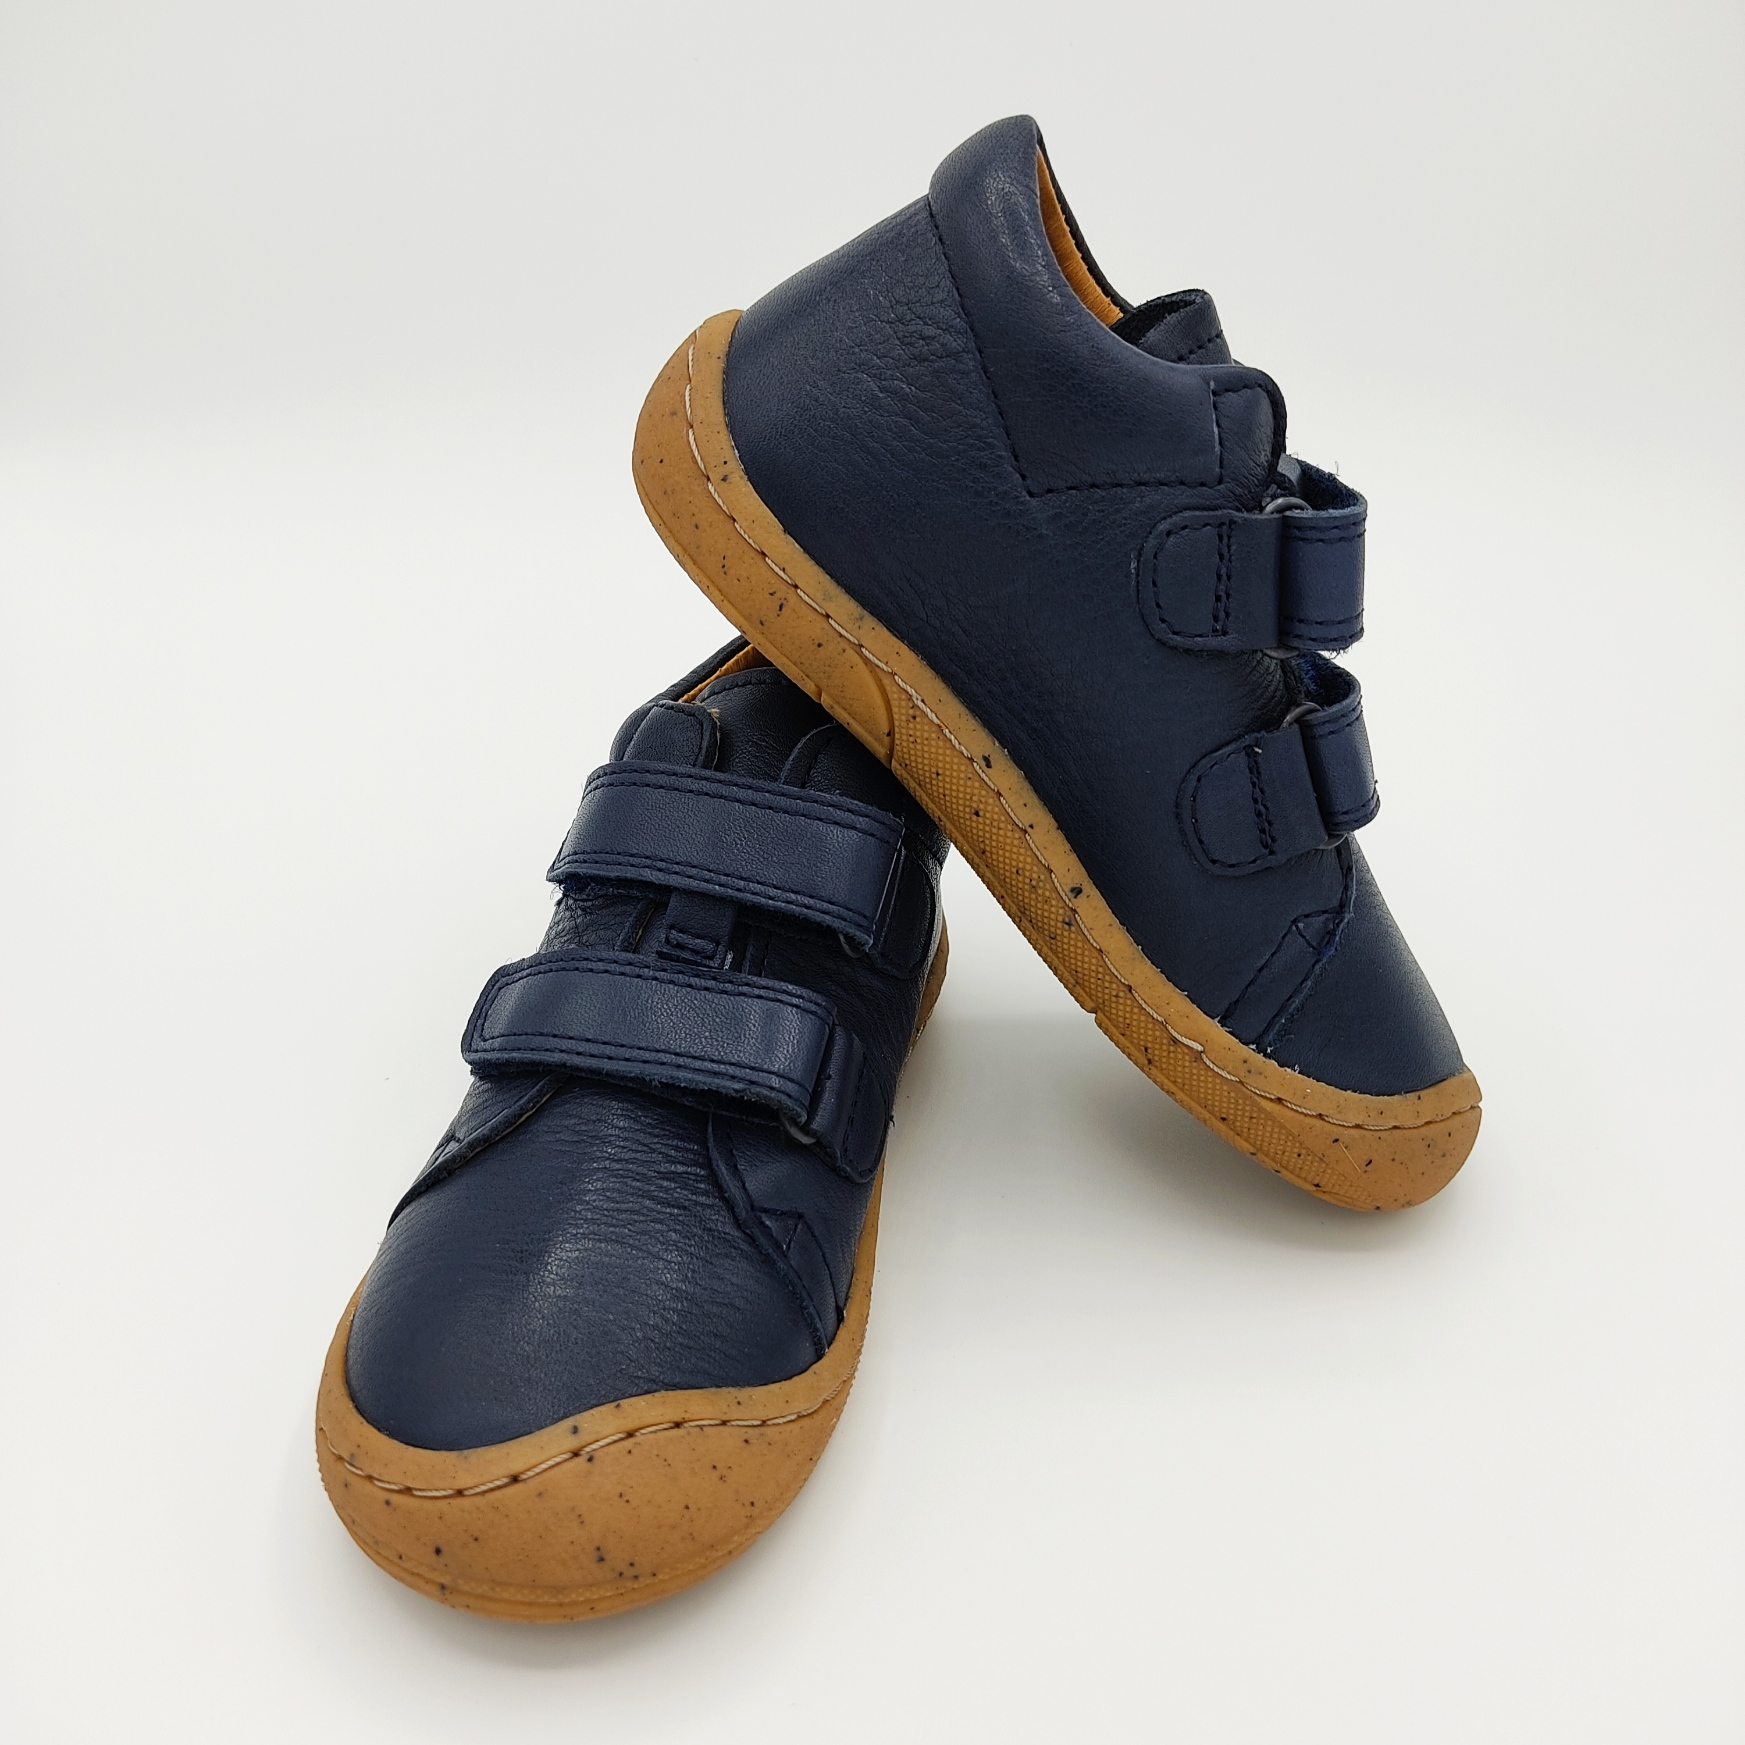 Chaussures MINNI VELCRO Froddo Flexible - blue